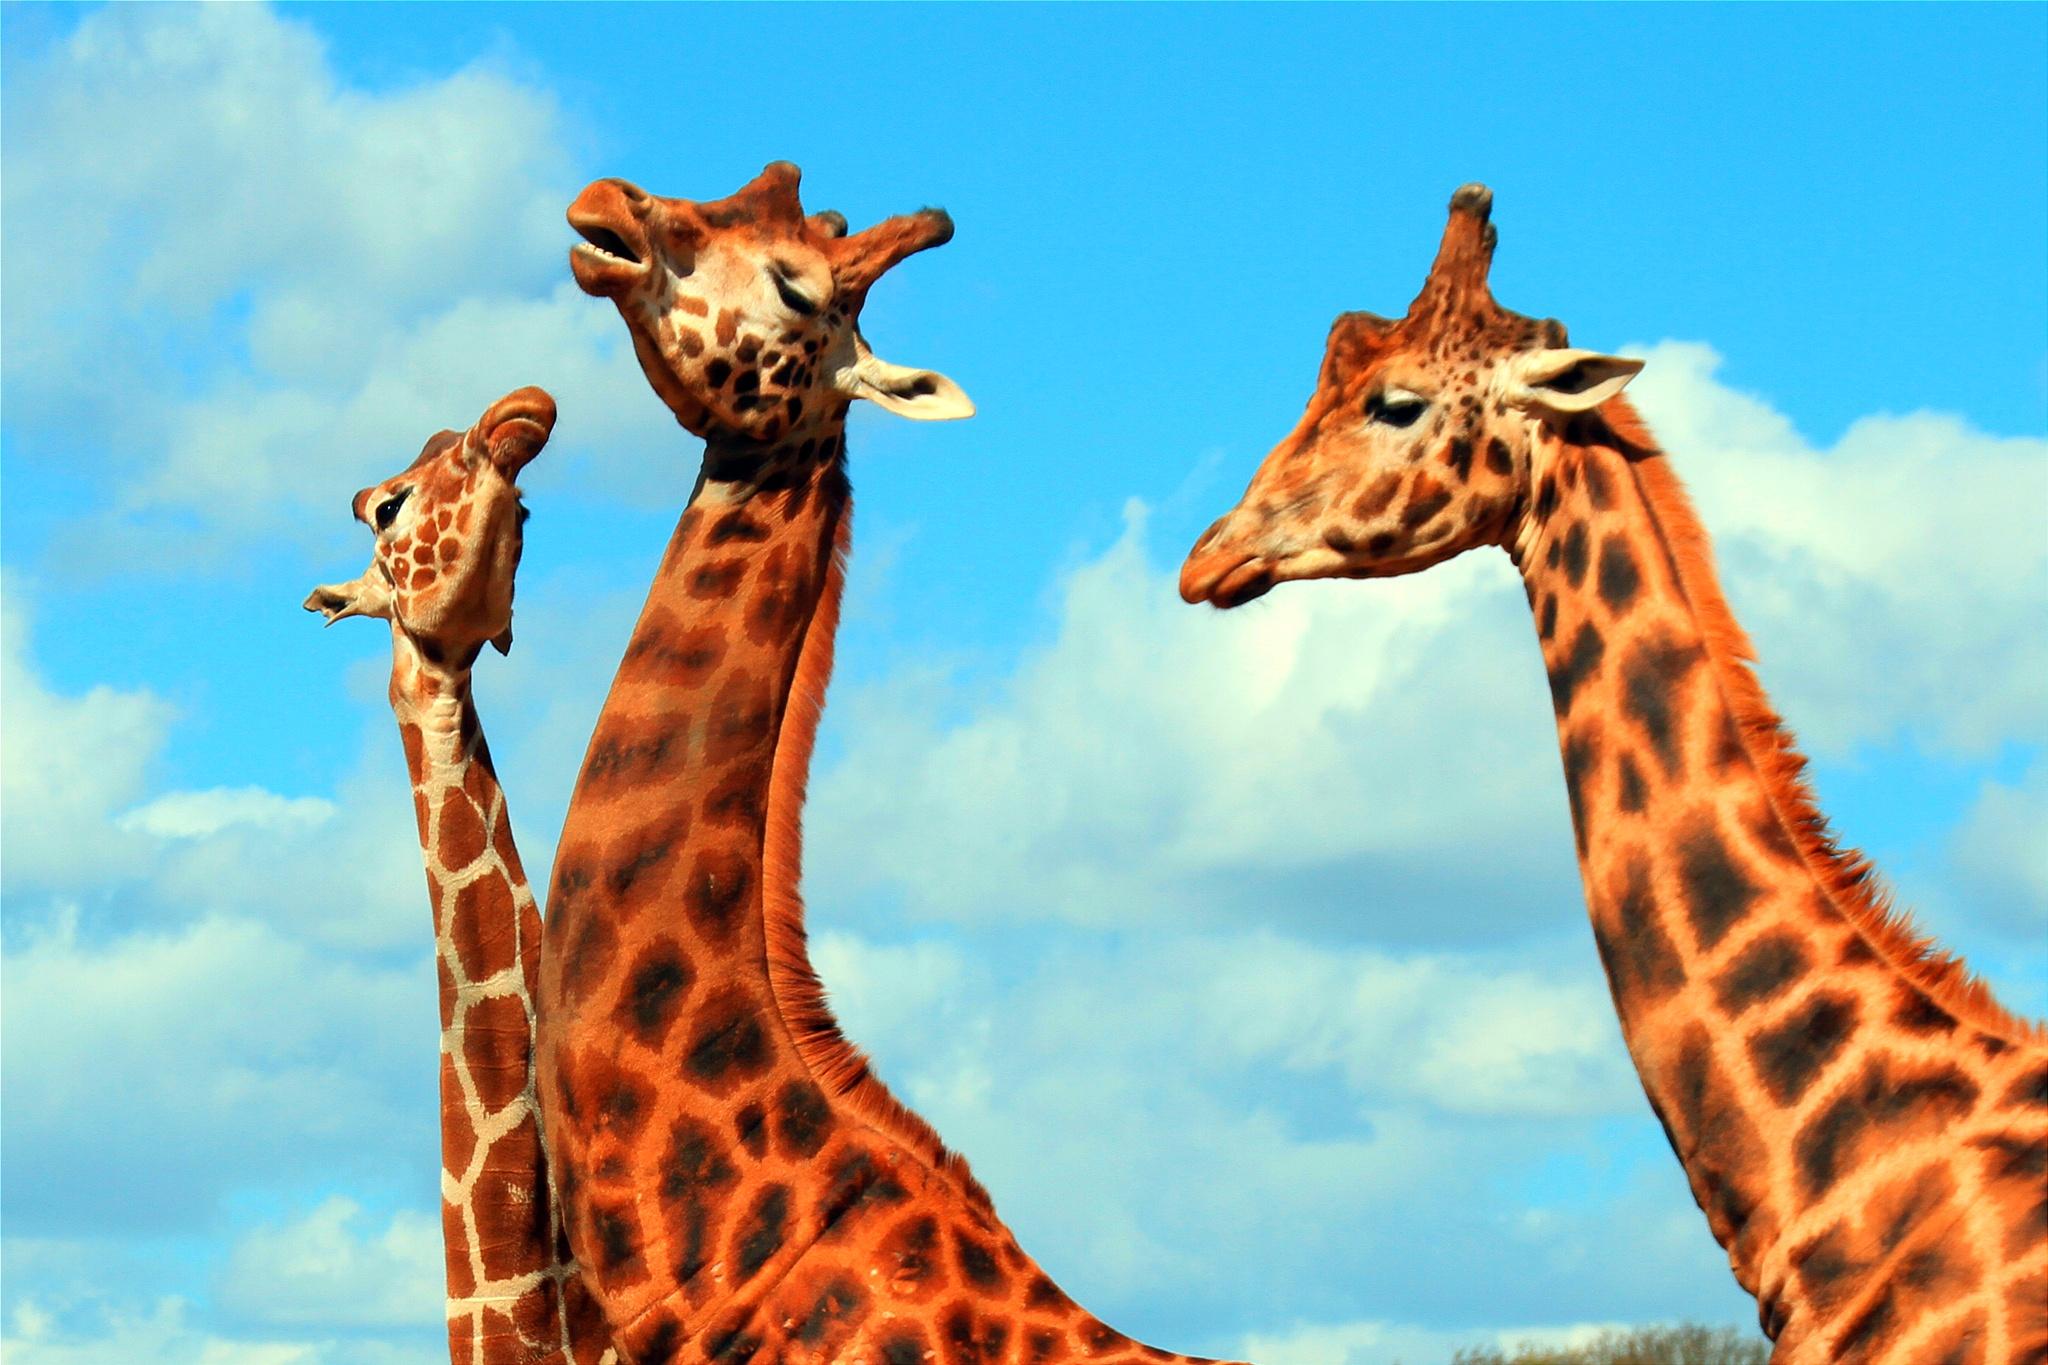 Three Giraffe's by Martin Roper